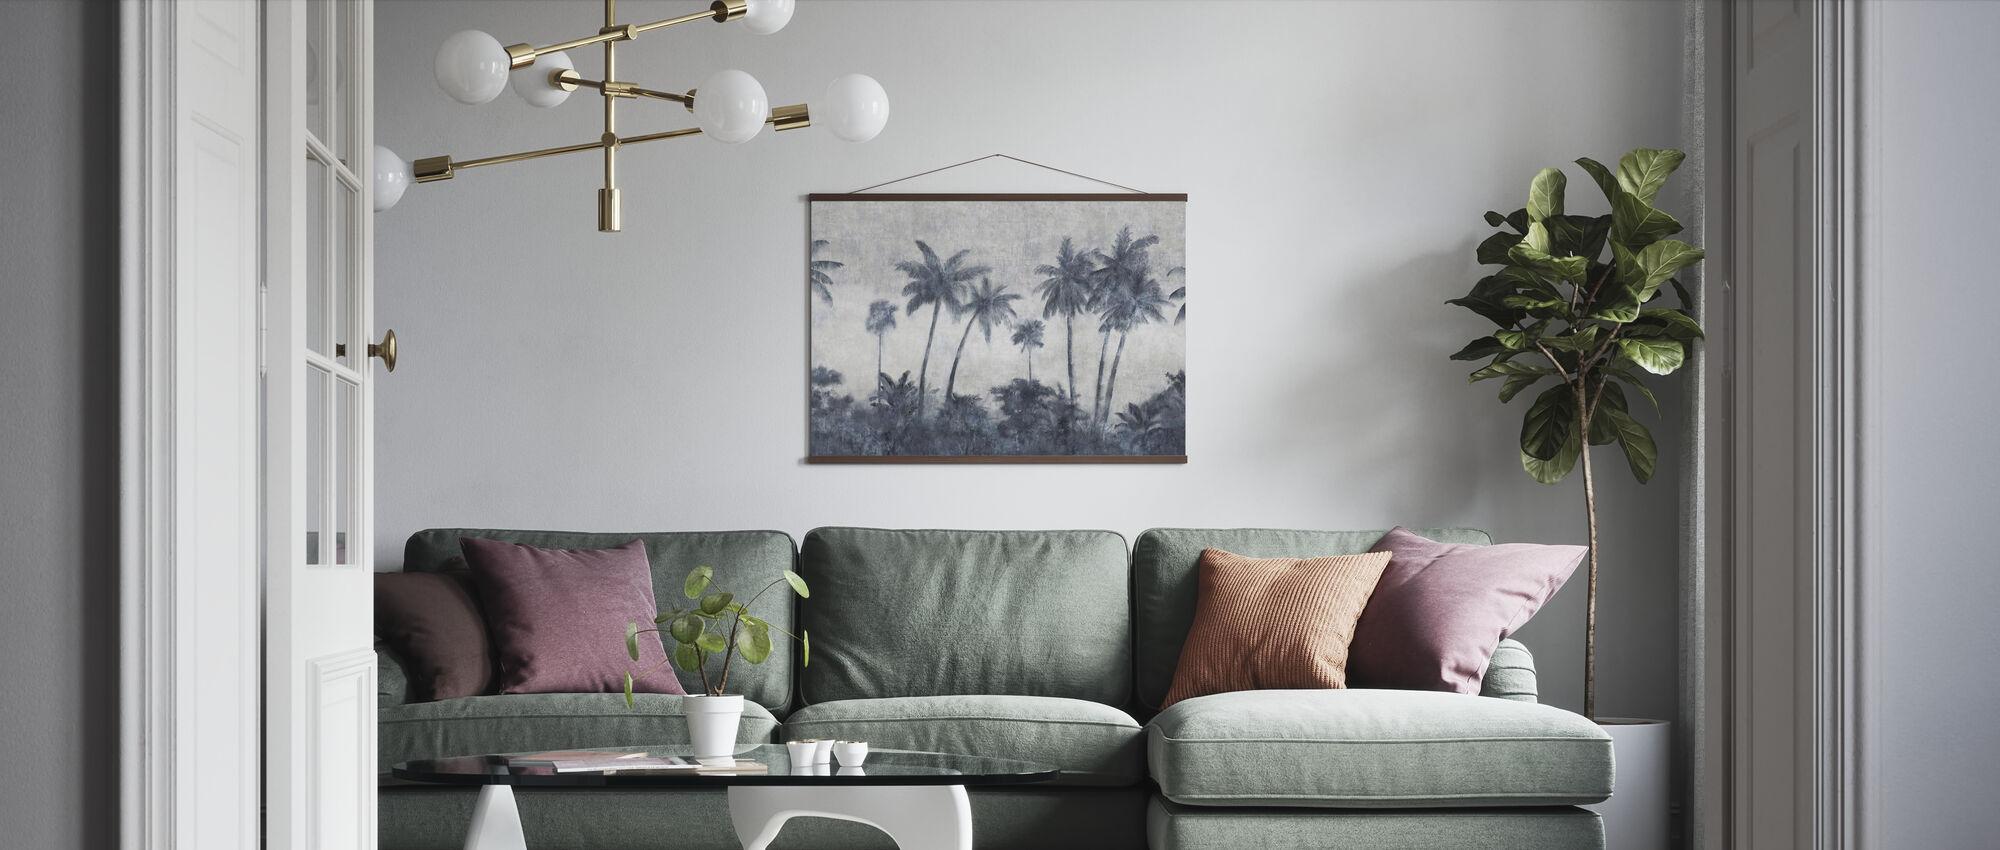 California Palmes on Concrete - Poster - Living Room